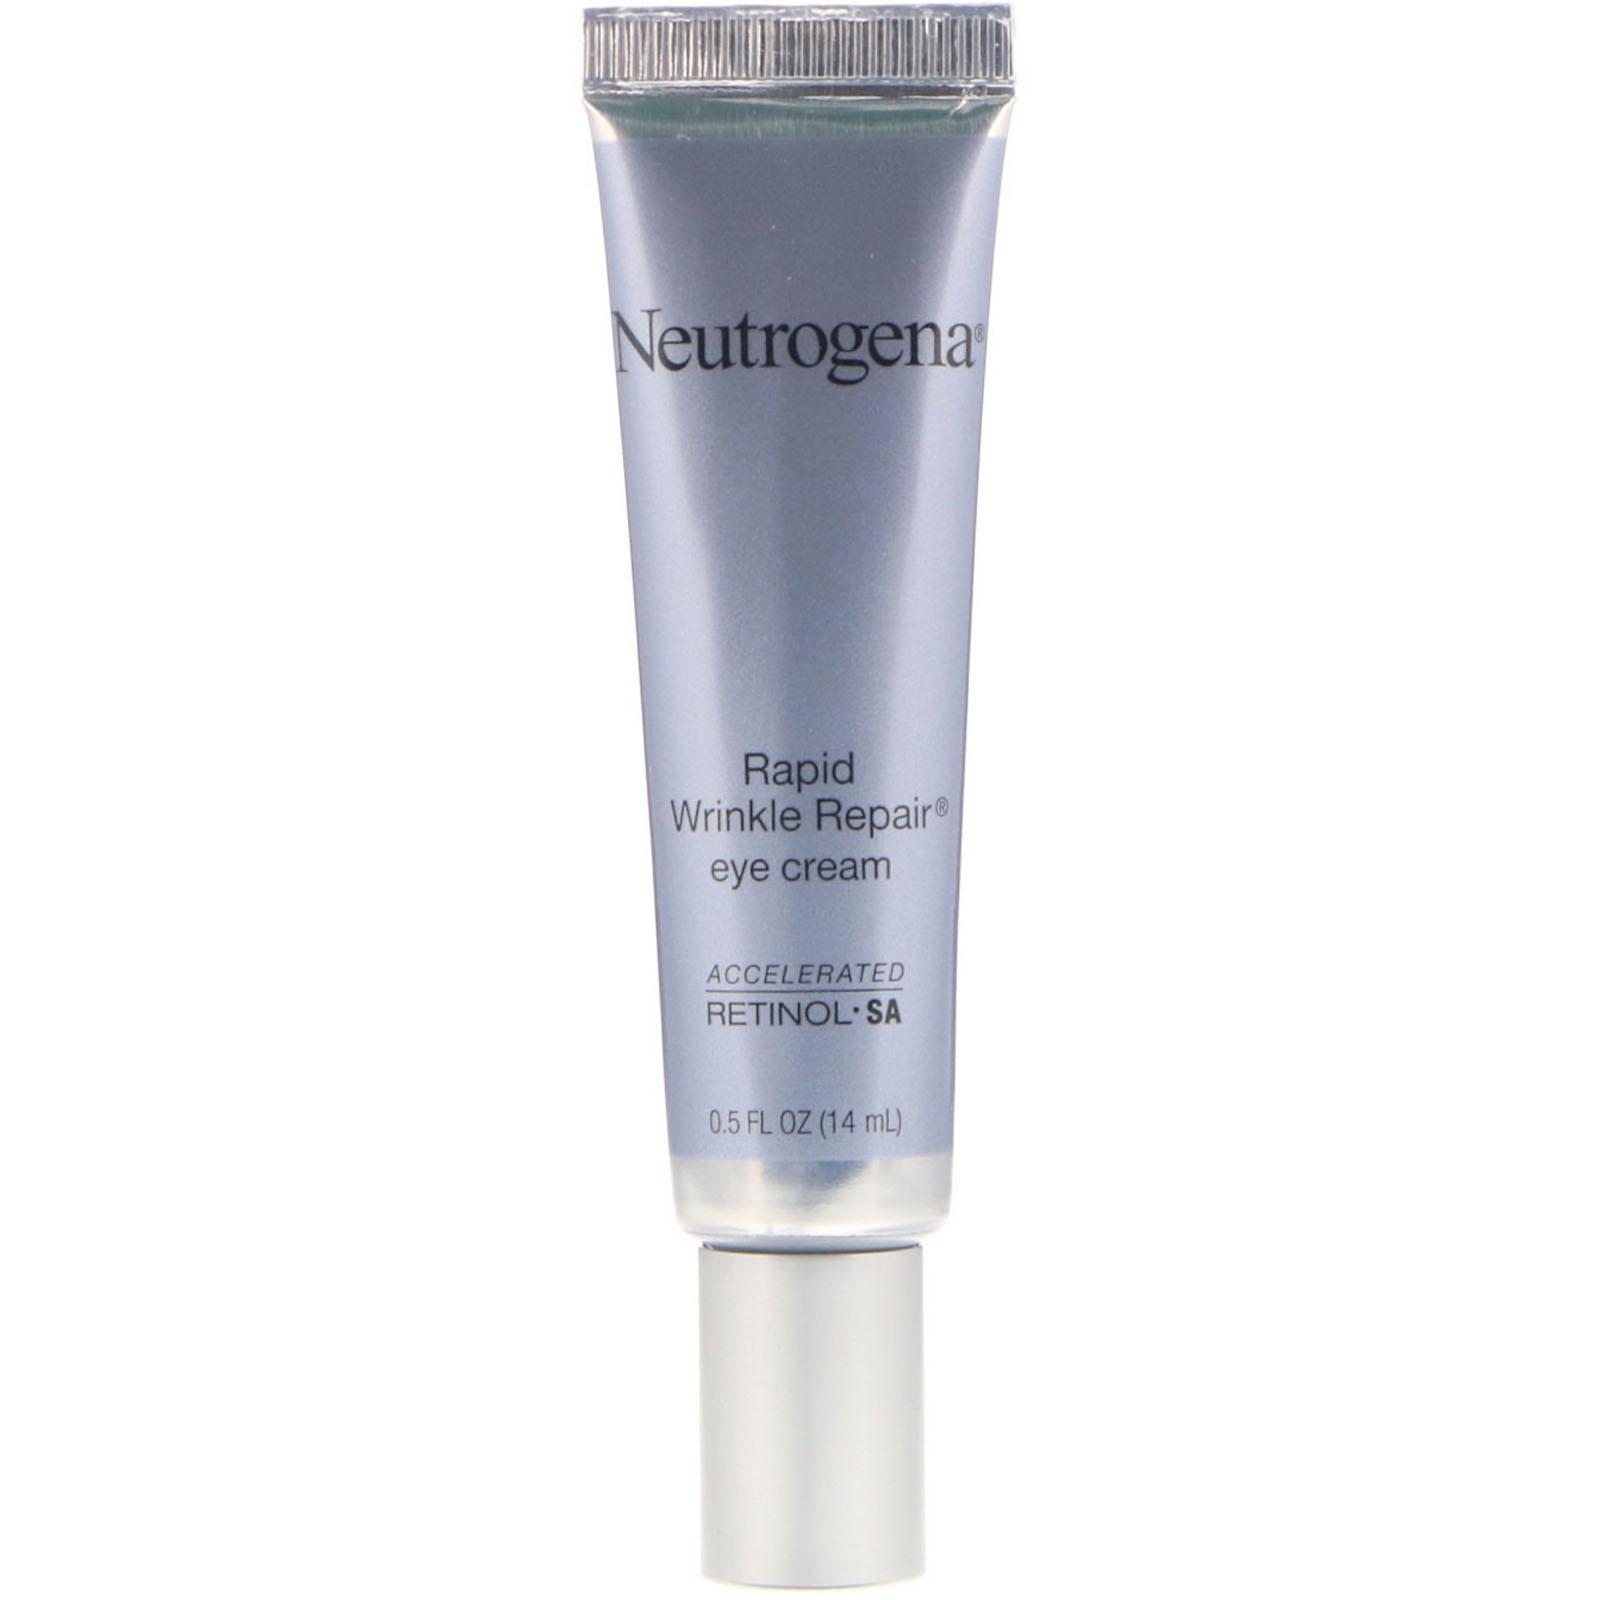 Neutrogena, Rapid Wrinkle Repair, Eye Cream, 0.5 fl oz (14 ml) - iHerb